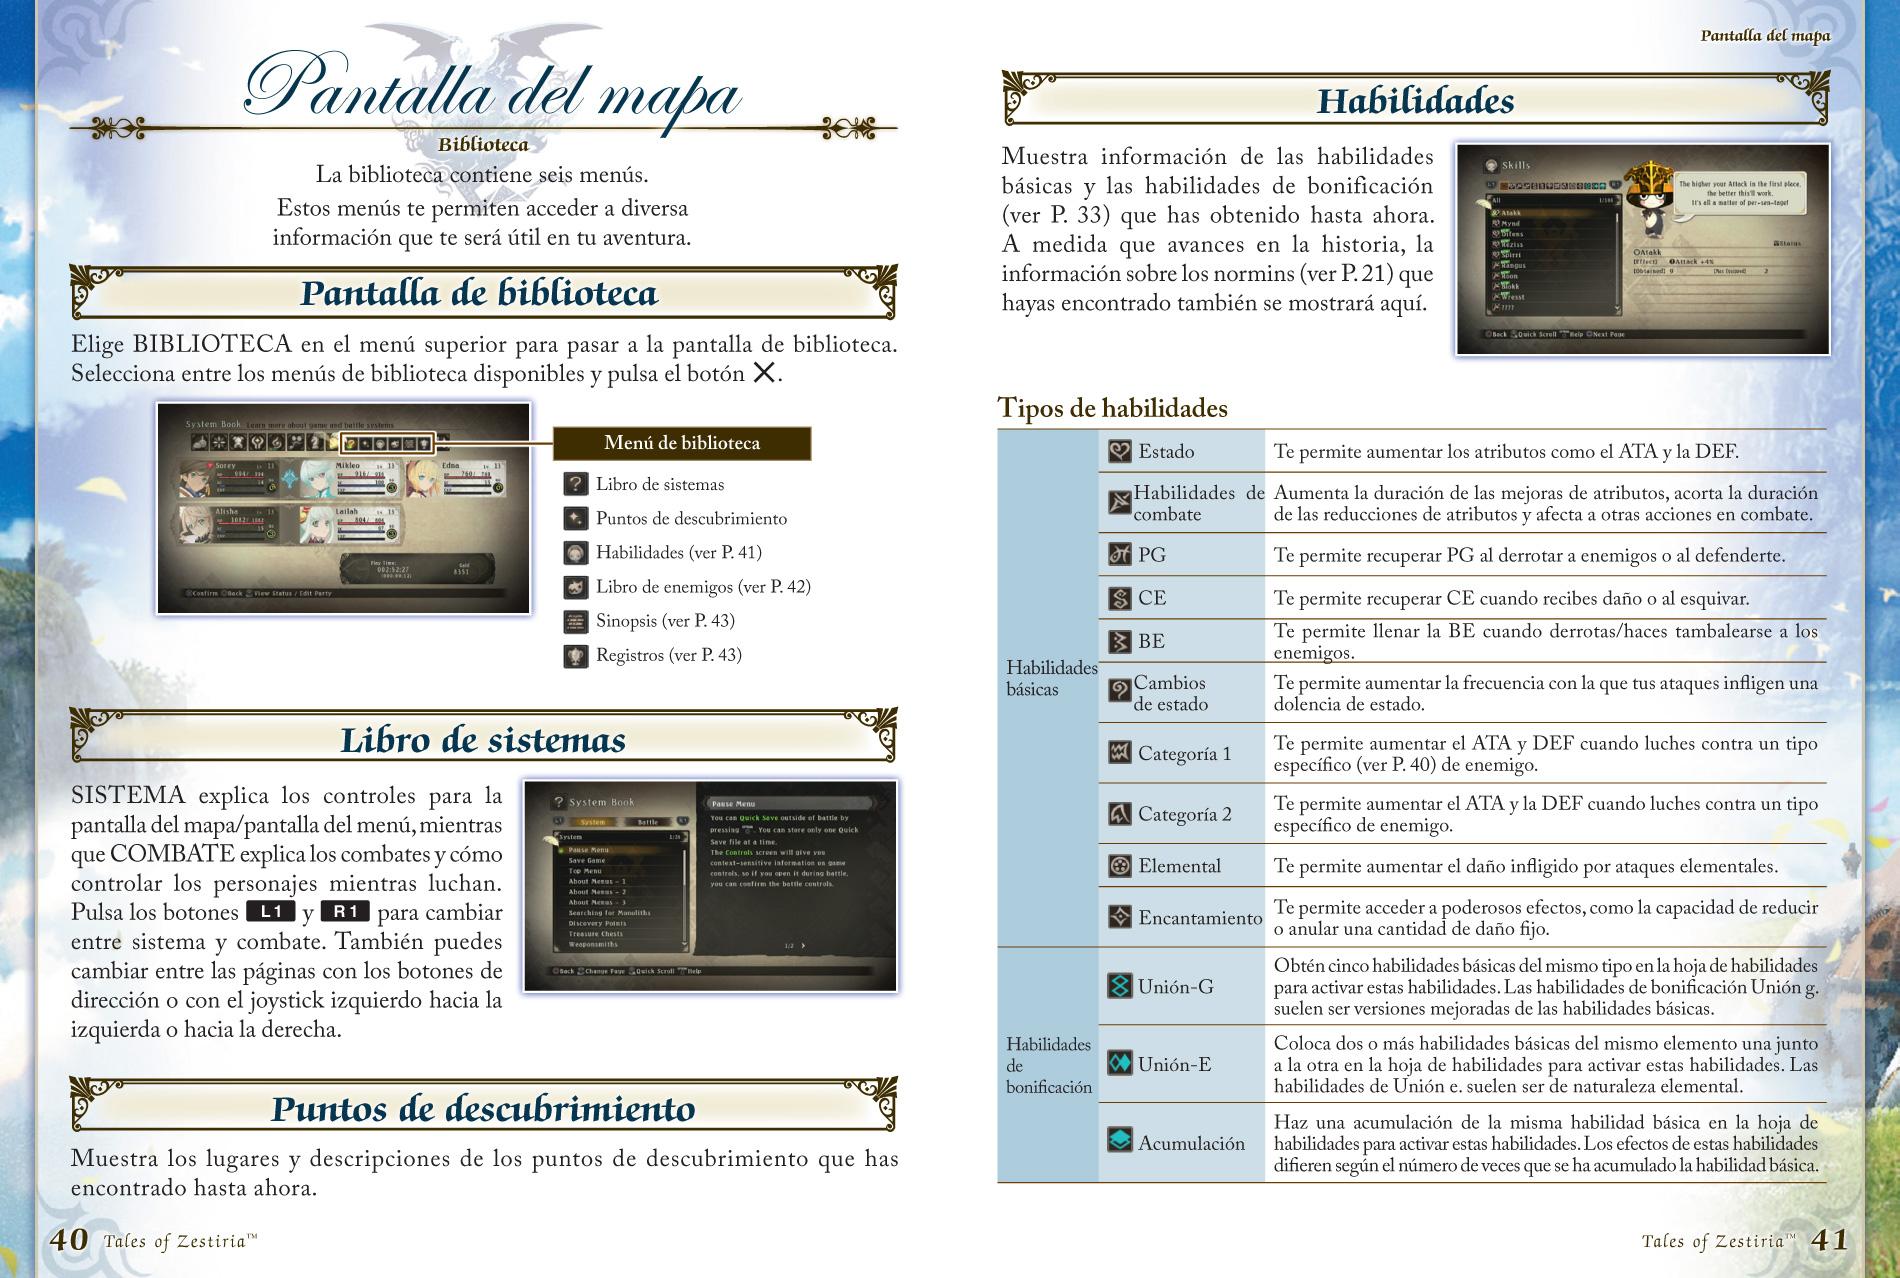 Tales of Zestiria - Playstation 4 E-manual